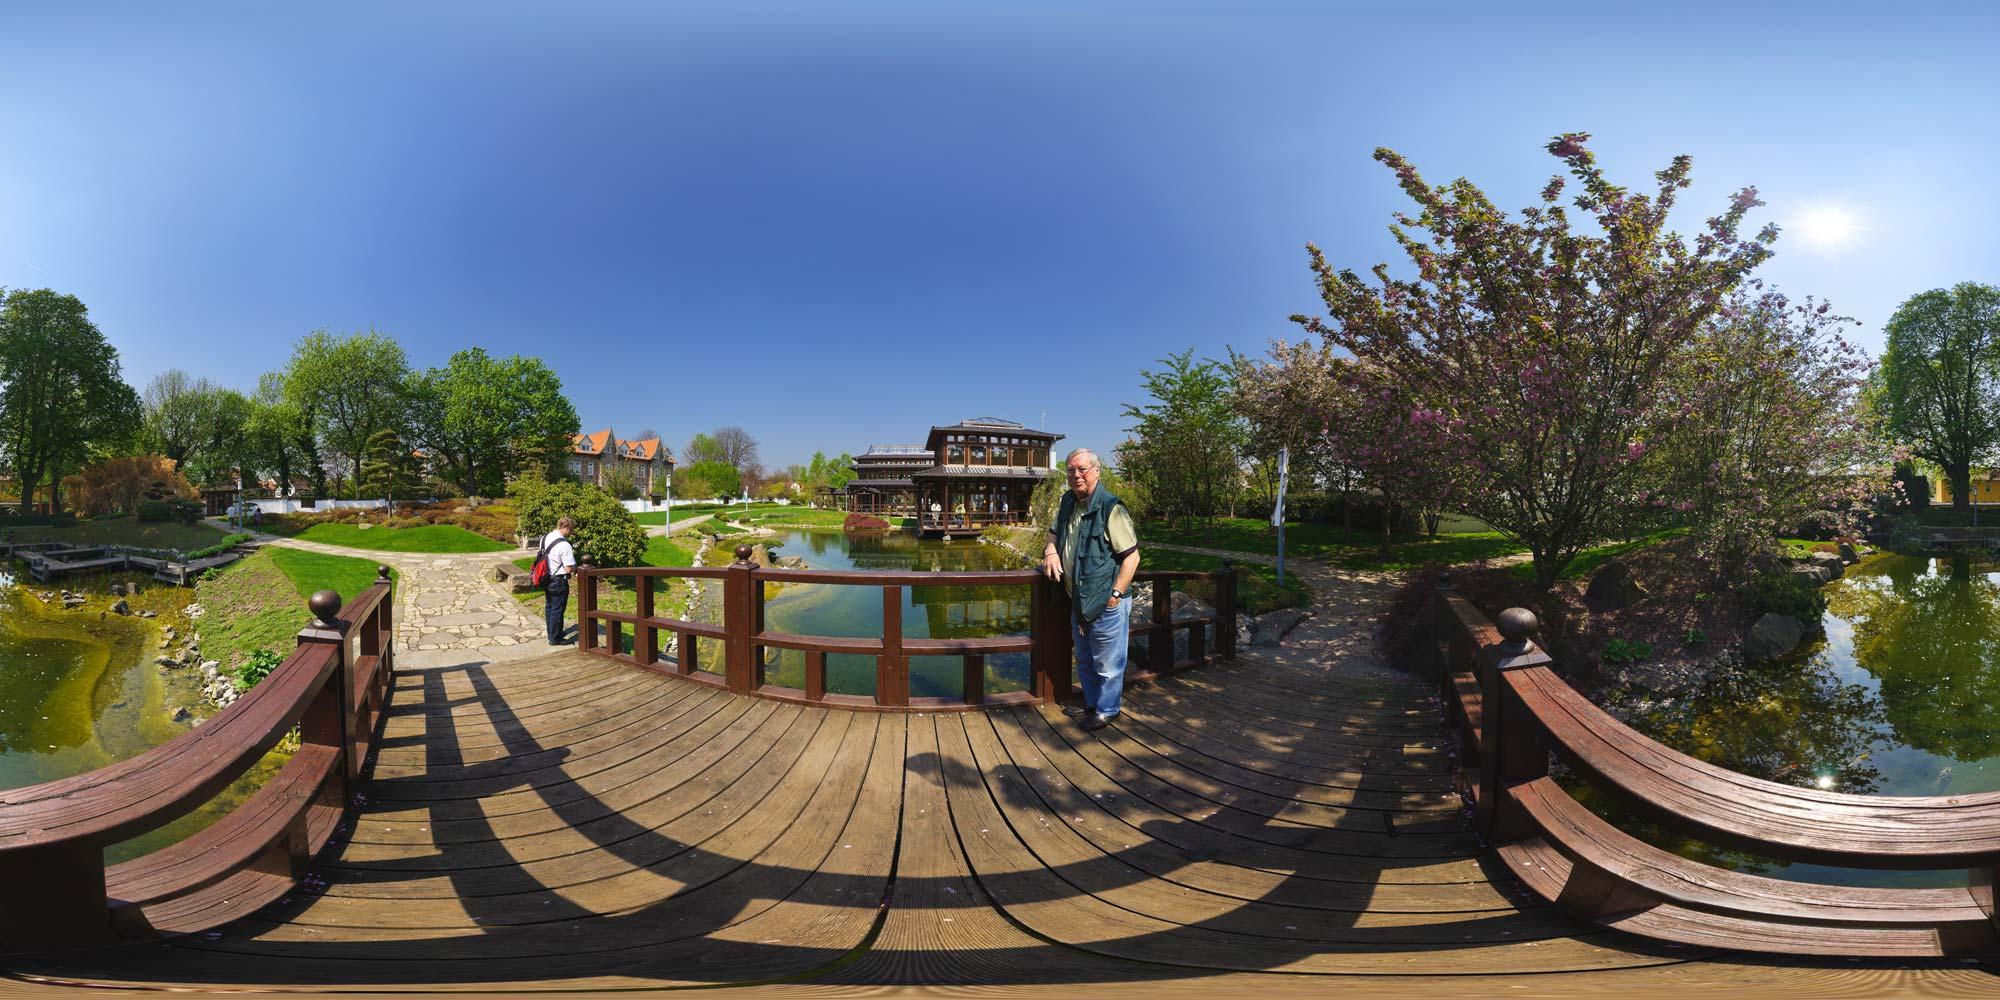 Panorama: Bad Langensalza - Japanischer Garten - Bogenbrücke Karte ...